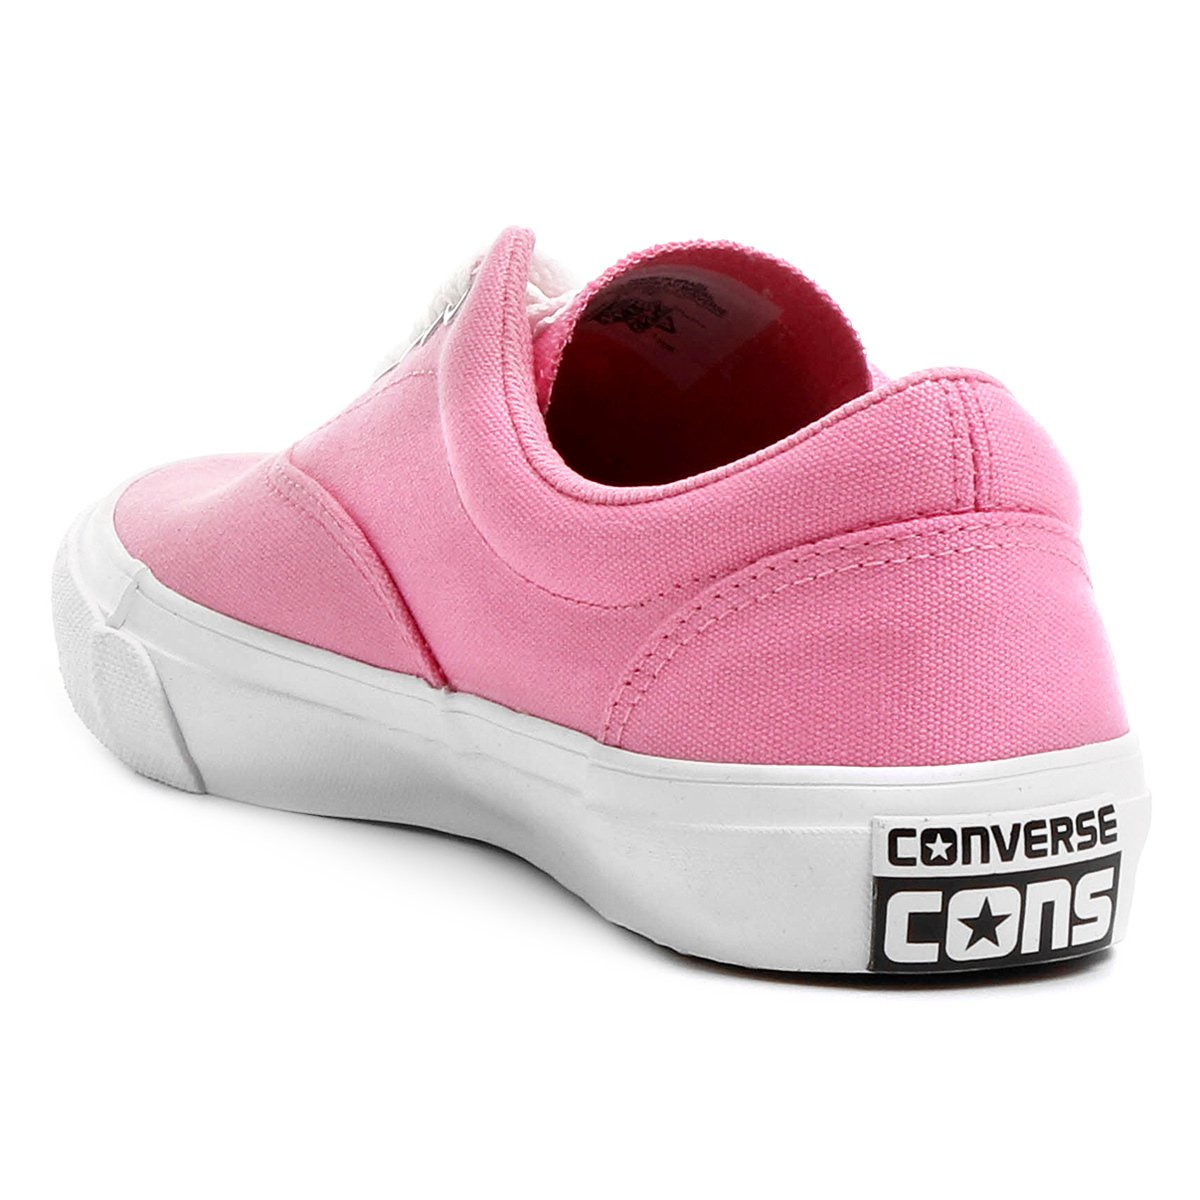 Branco e Skidgrip Cvo Converse Tênis Cvo Rosa Tênis e Converse Skidgrip Rosa nvBApwP4